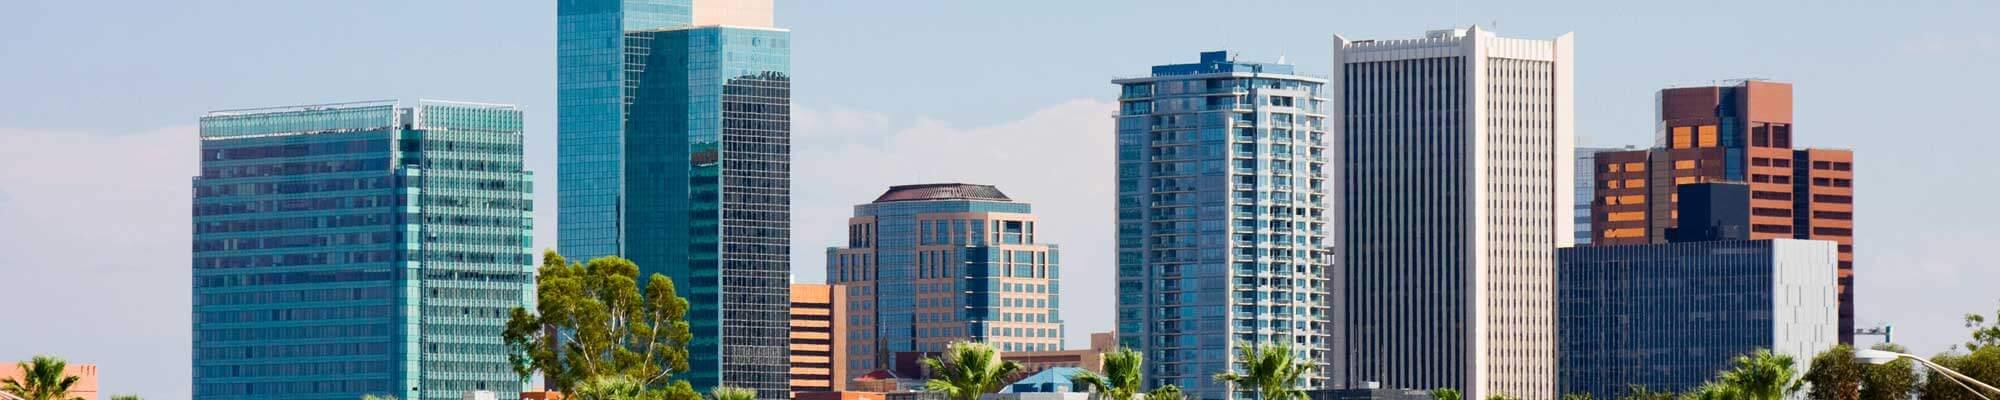 Downtown-Phoenix-AZ